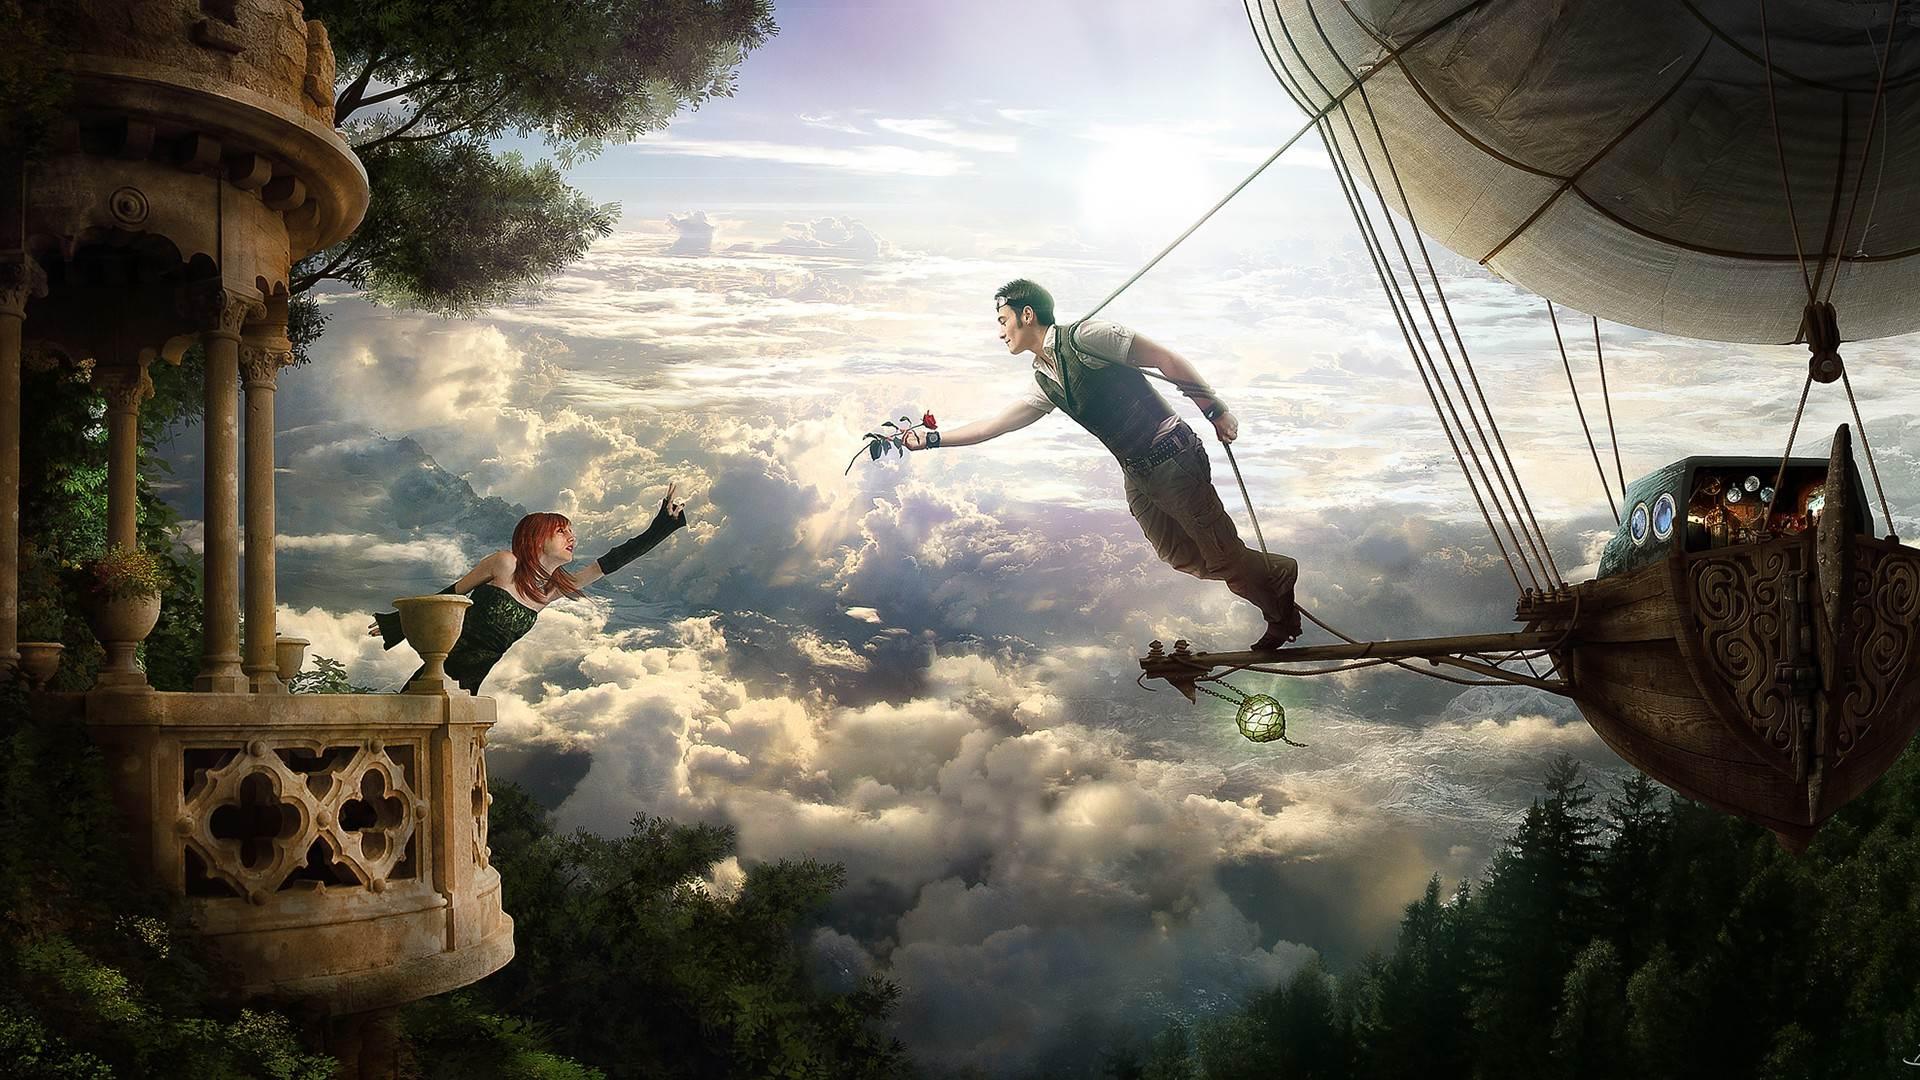 Fantasy Couple Romantic wallpaper | Best HD Wallpapers